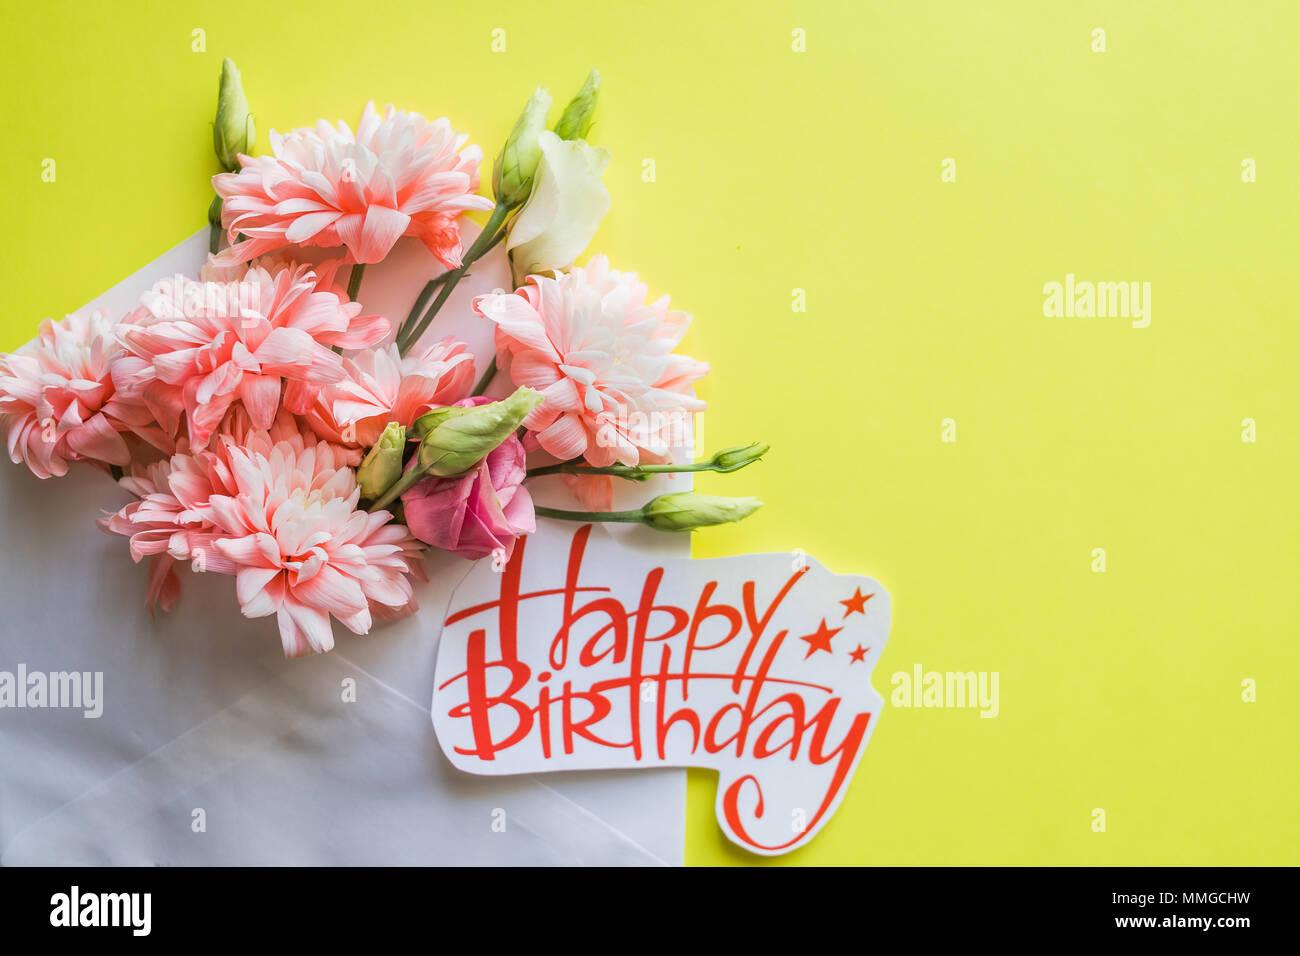 Soft pink chrysanthemums and happy birthday posterautiful flowers soft pink chrysanthemums and happy birthday posterautiful flowers card with spring bouquethappy birthday card with chrysanthemums izmirmasajfo